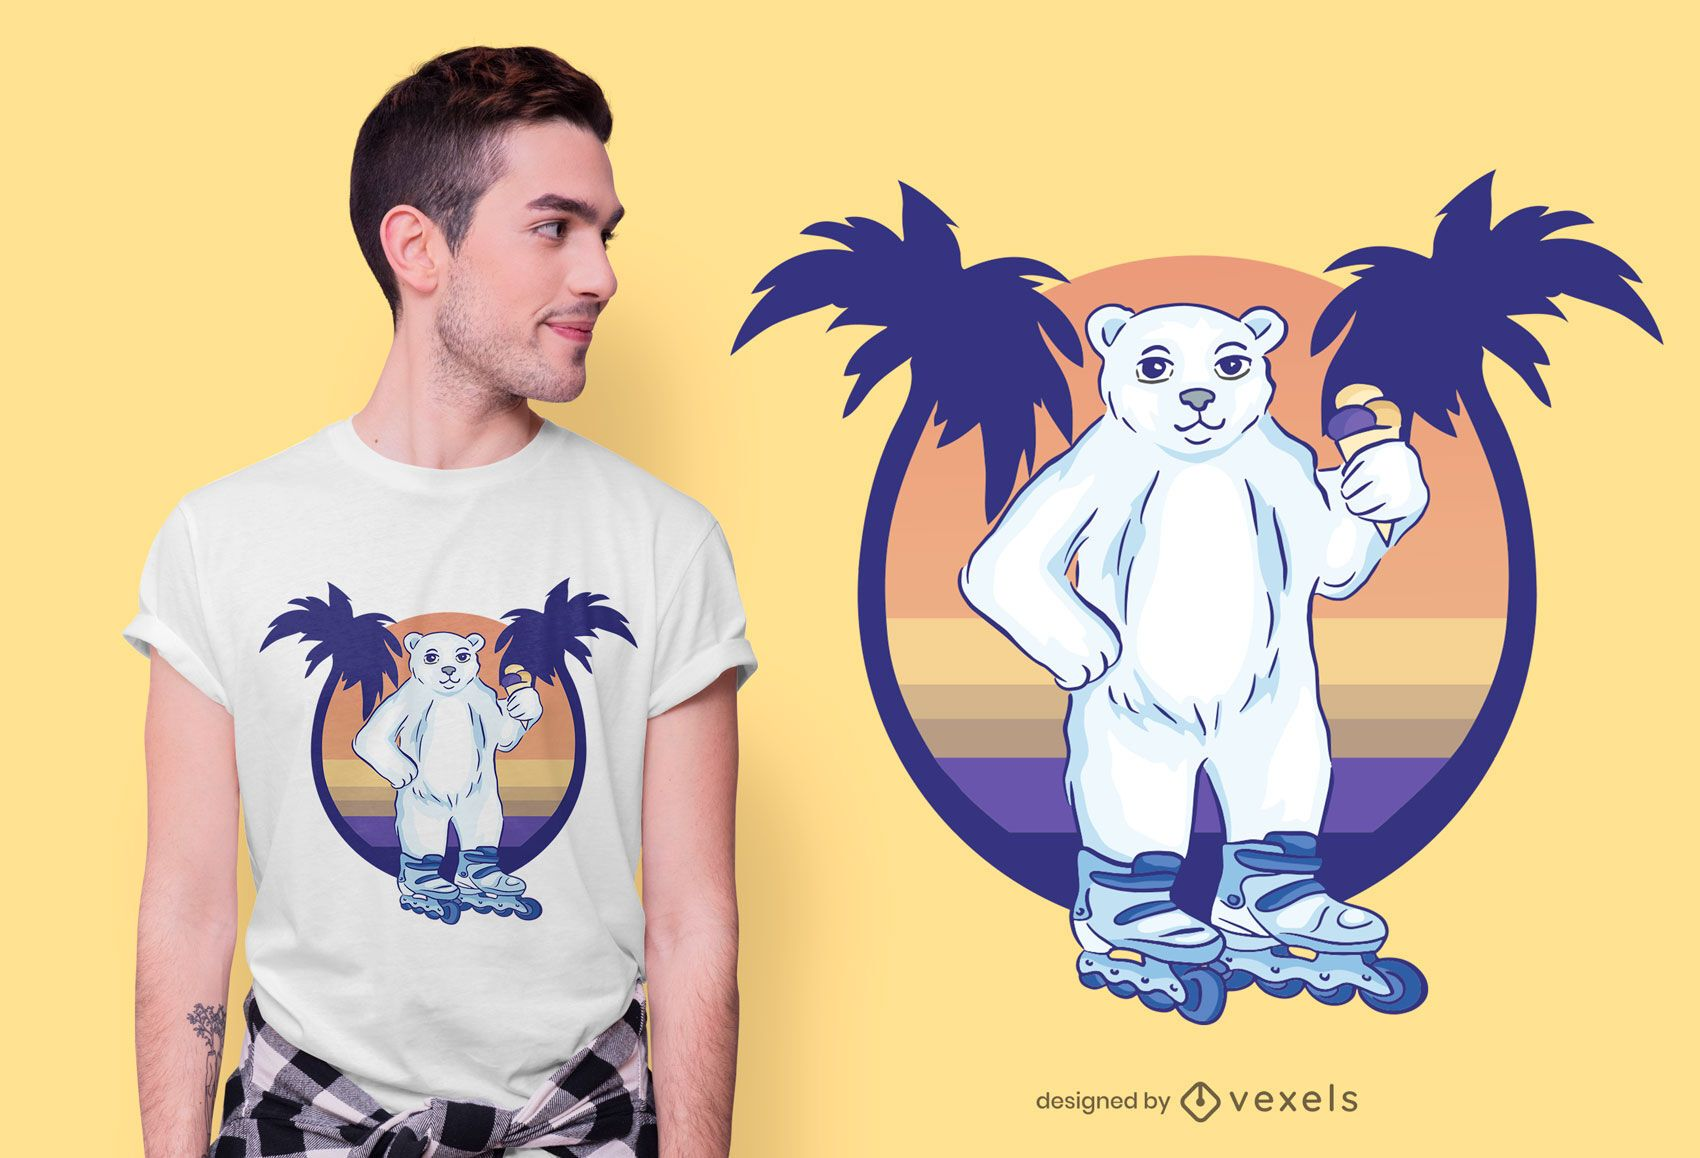 Roller skating bear t-shirt design